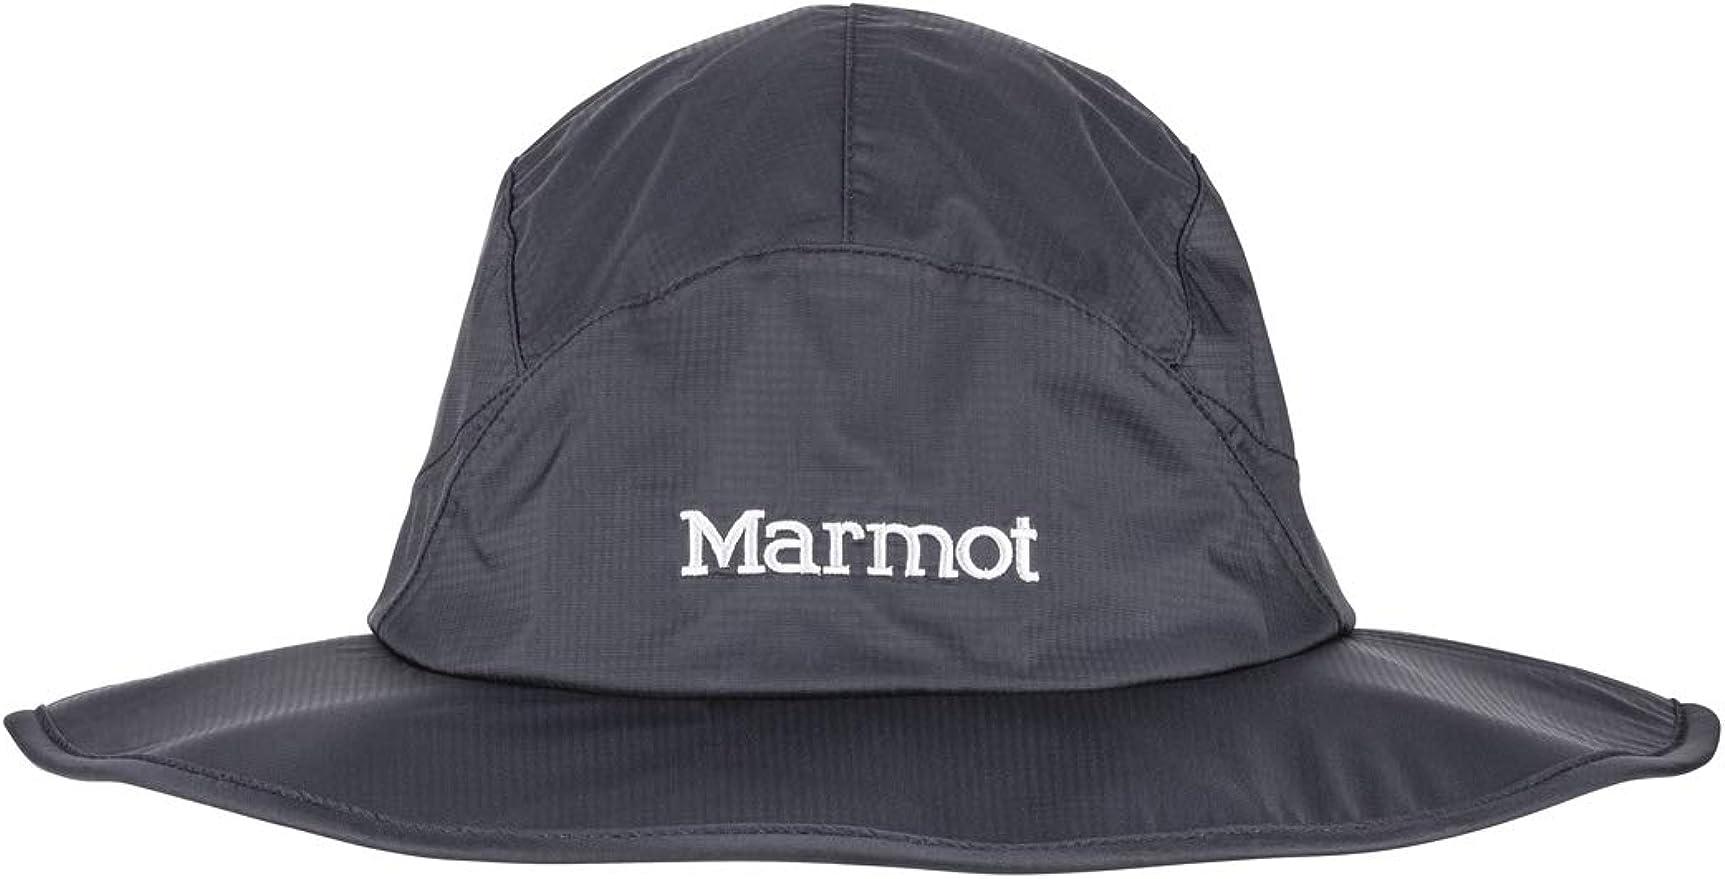 Waterproof Marmot Unisex Precip Eco Safari Hat Hardshell Safari Hat Sun Headwear